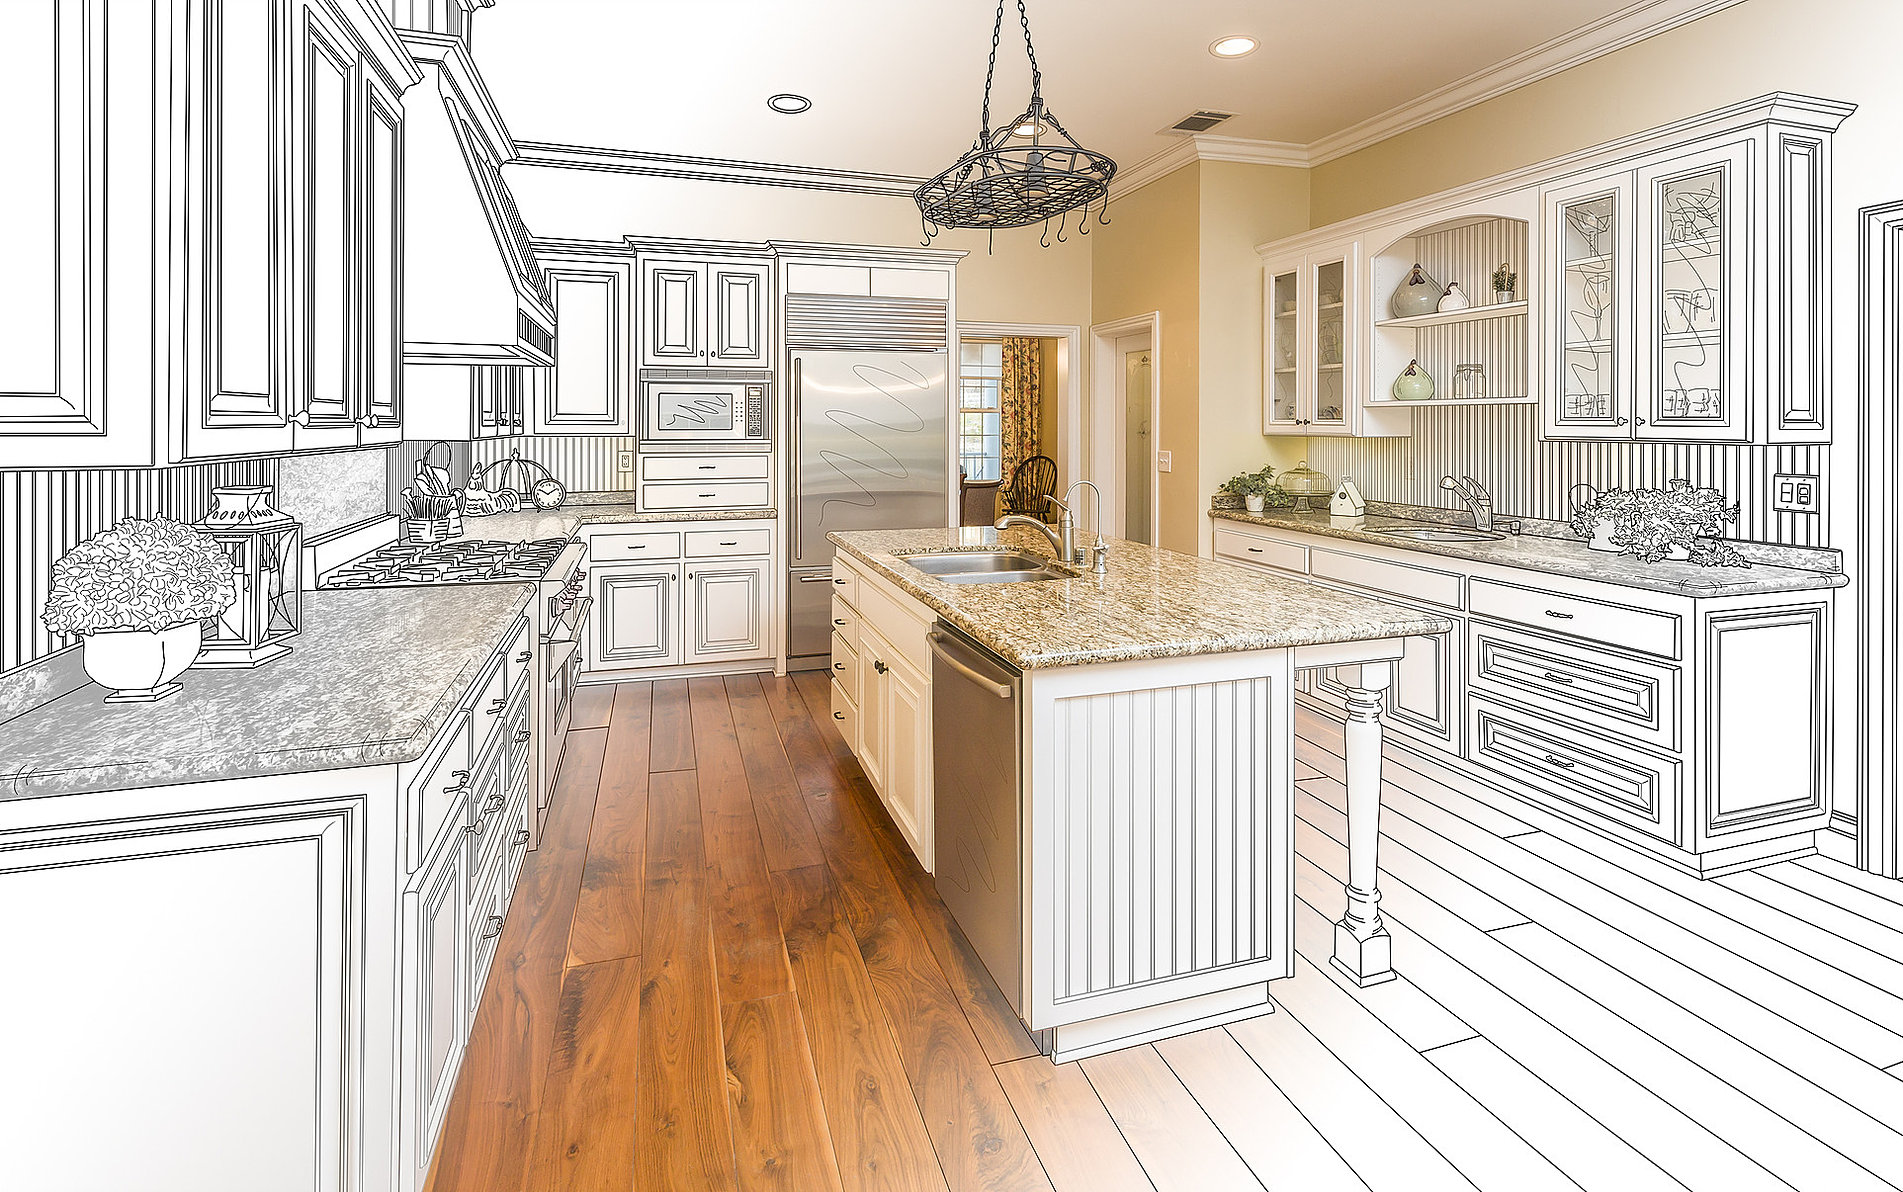 good Kitchen Remodeling Oakland Ca #5: kitchen remodeling in oakland ca